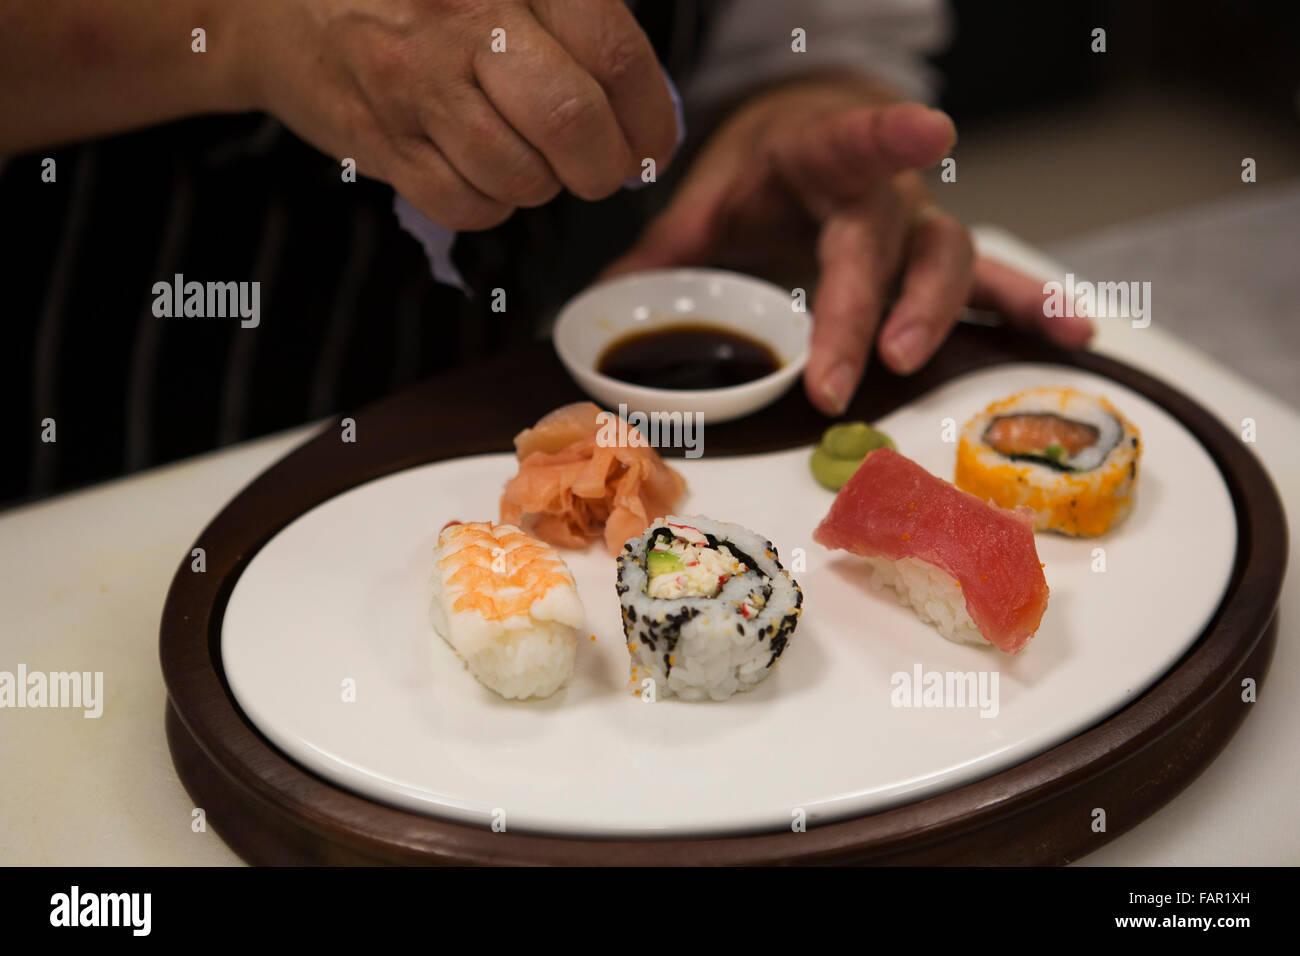 Singapore Airport Food Stockfotos & Singapore Airport Food Bilder ...